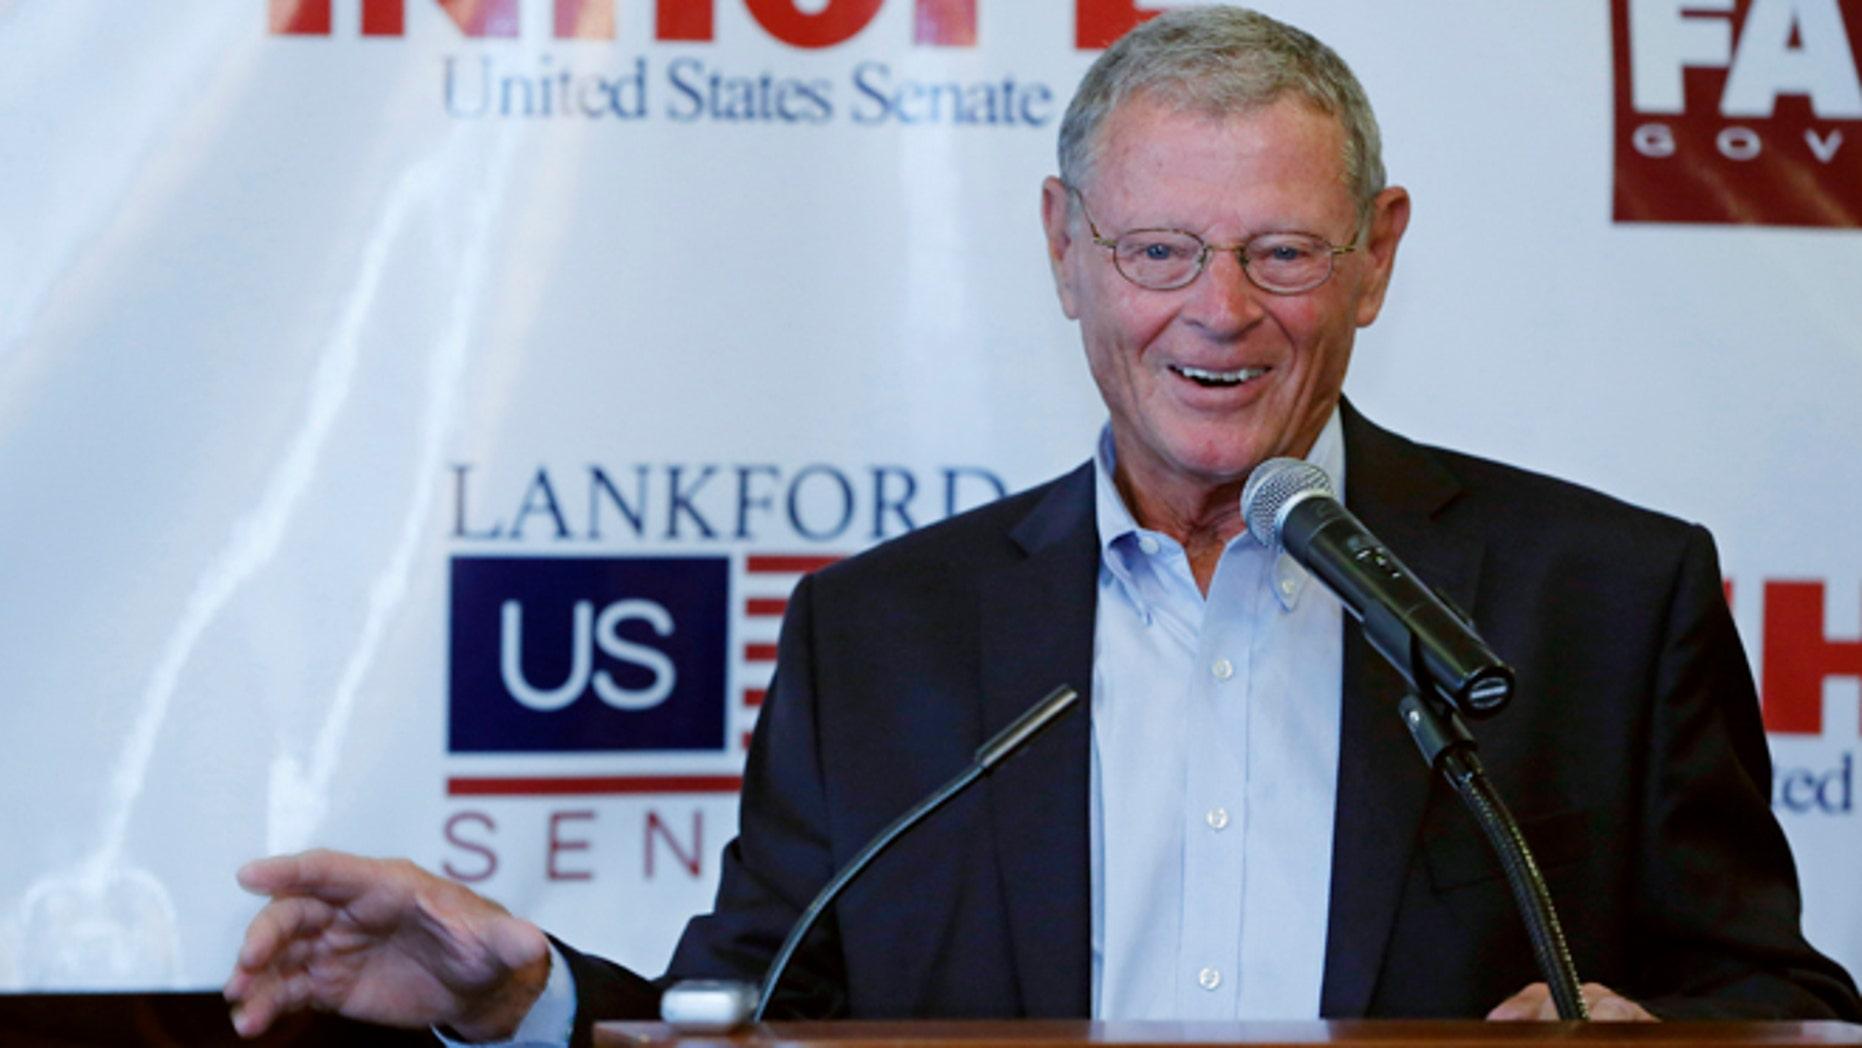 Sept. 2, 2014: Sen. Jim Inhofe, R-Oklahoma, speaks during a Republican rally in Edmond, Okla.